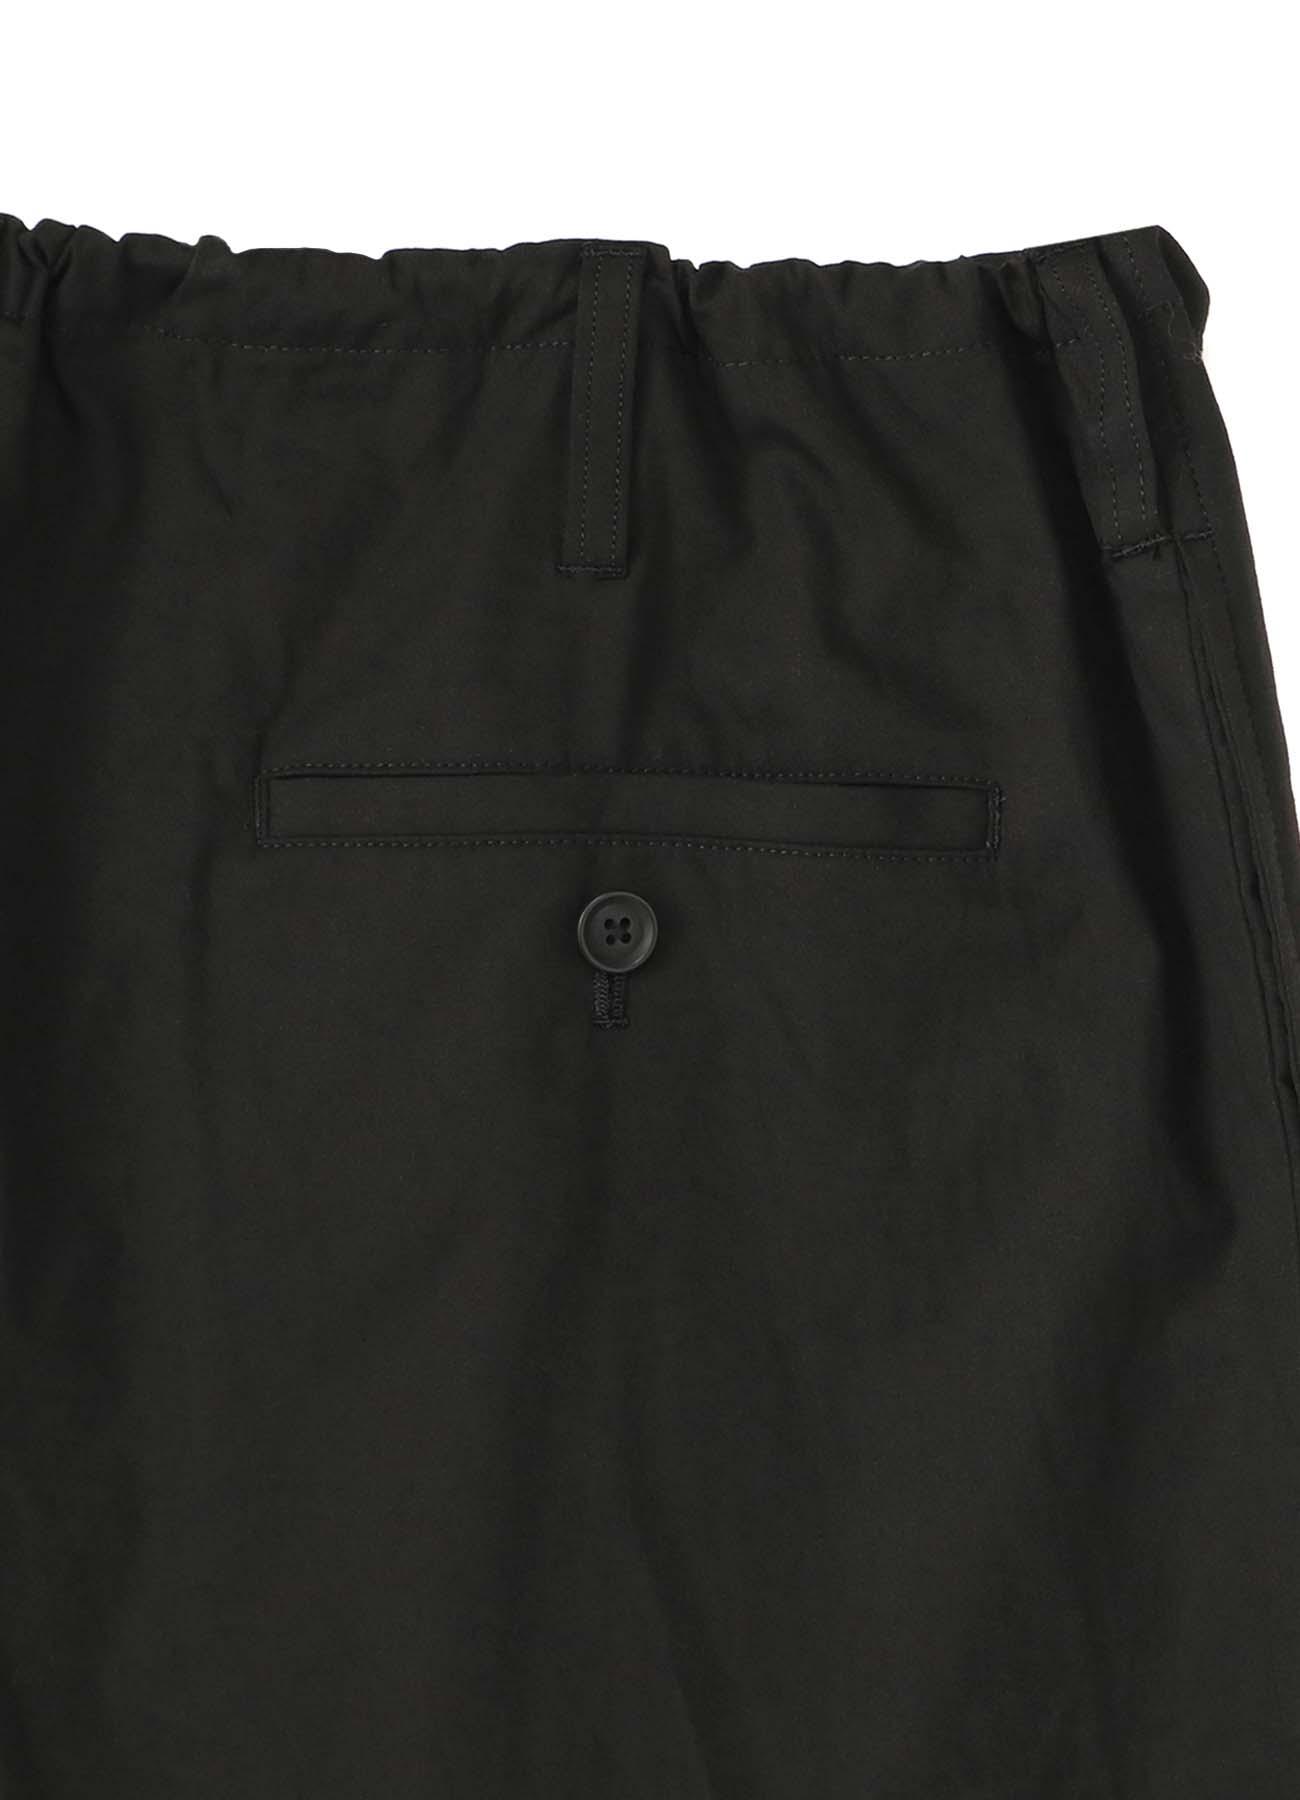 40/2 Cotton Broad Waist String Pants